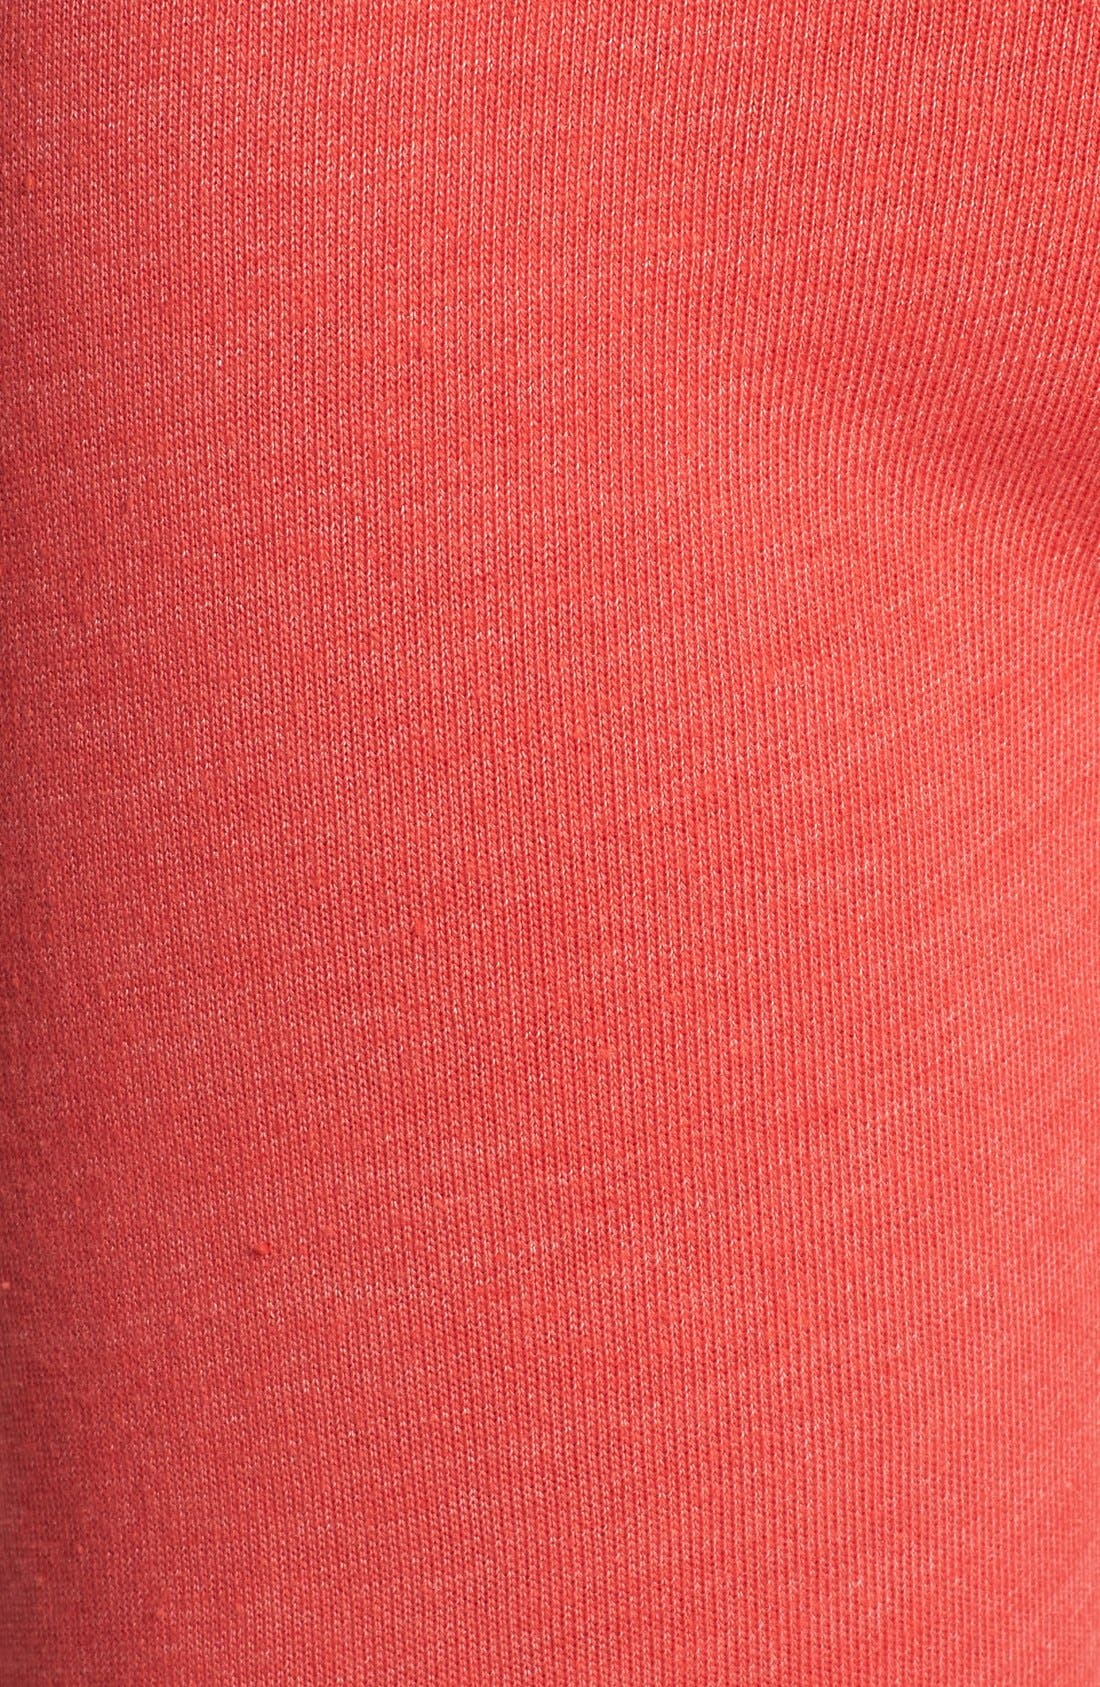 Heart & Stripes Sweatpants,                             Alternate thumbnail 2, color,                             800